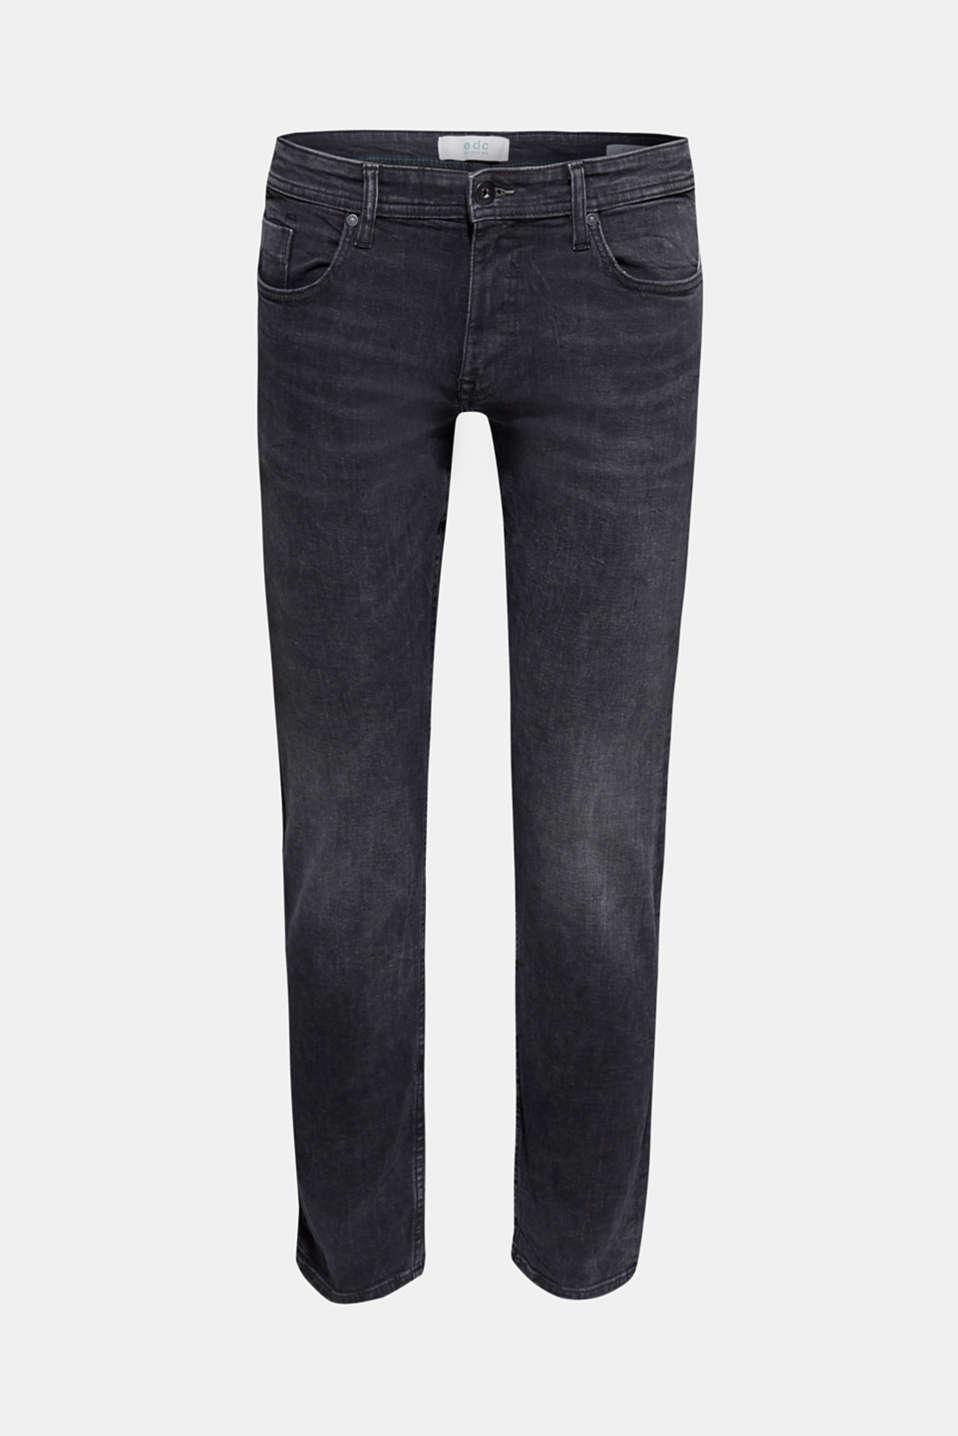 Pants denim, BLACK MEDIUM WASH, detail image number 5